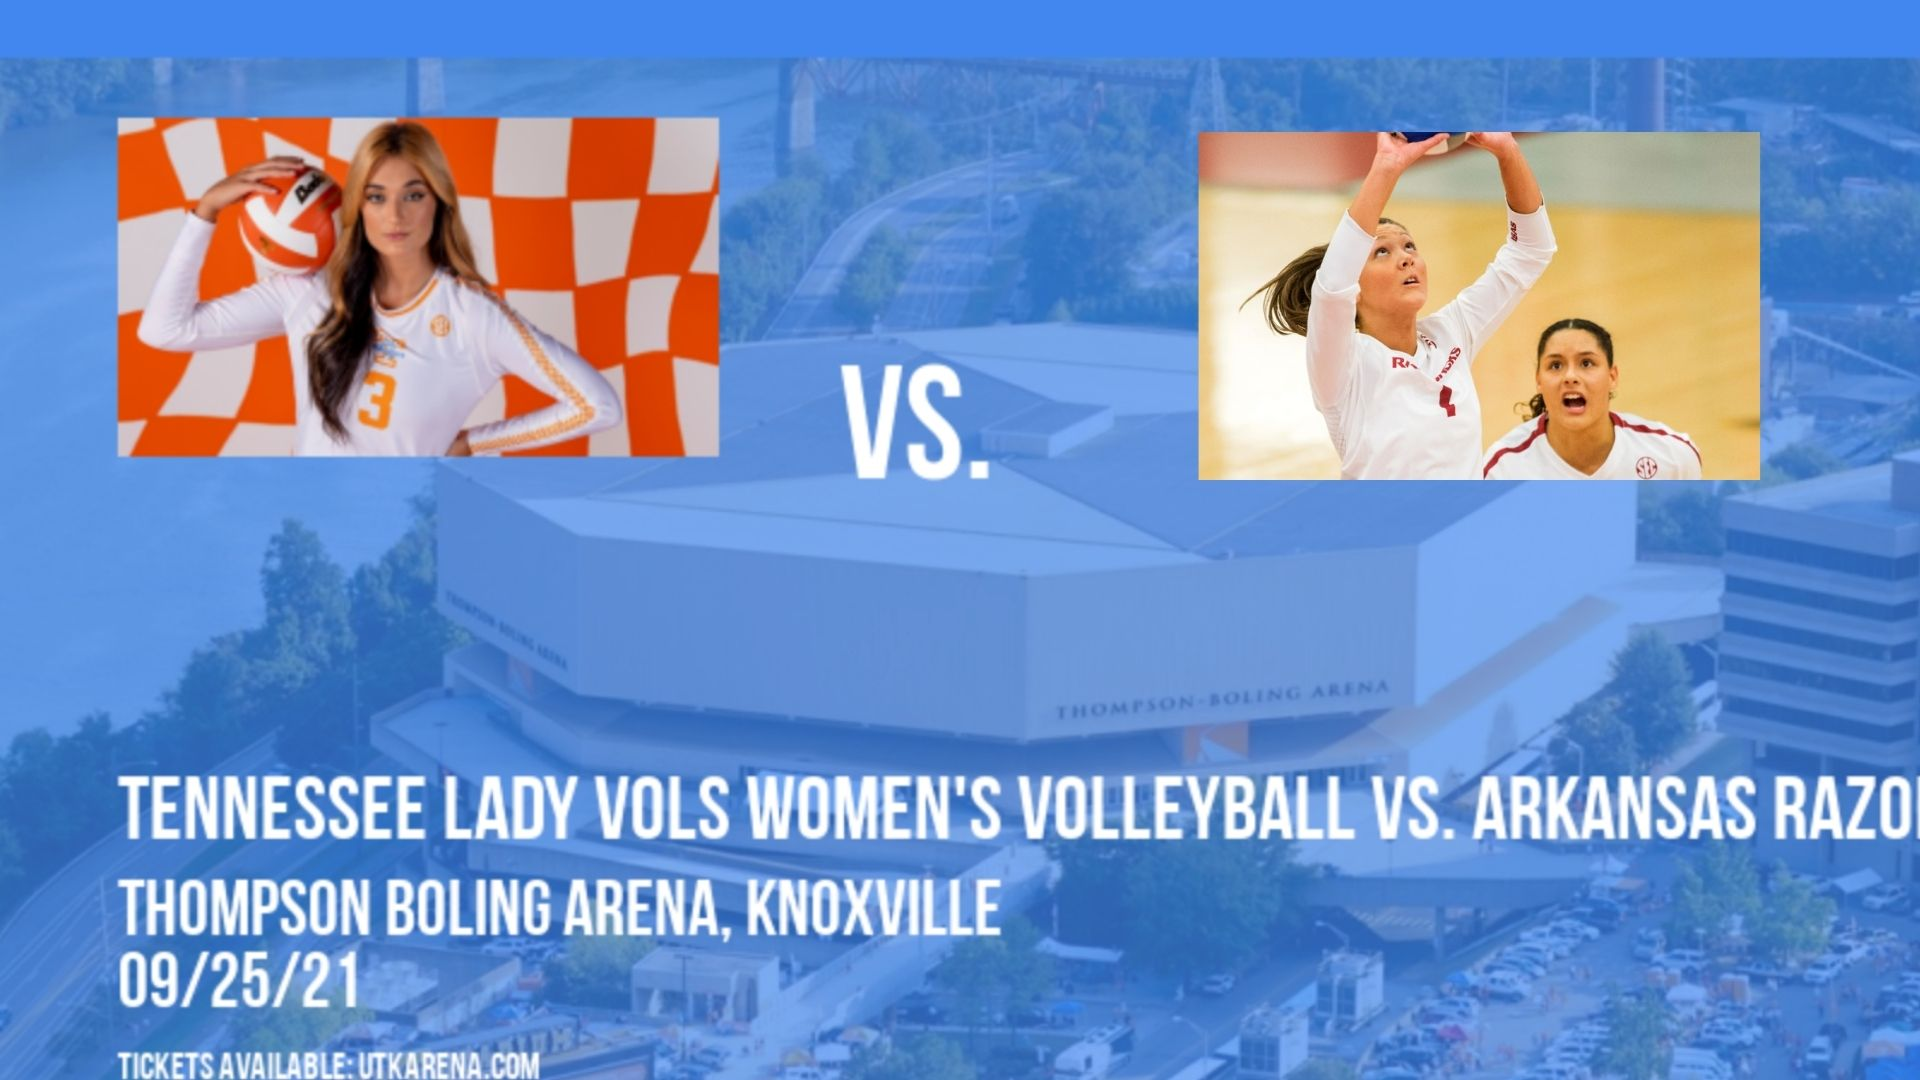 Tennessee Lady Vols Women's Volleyball vs. Arkansas Razorbacks at Thompson Boling Arena